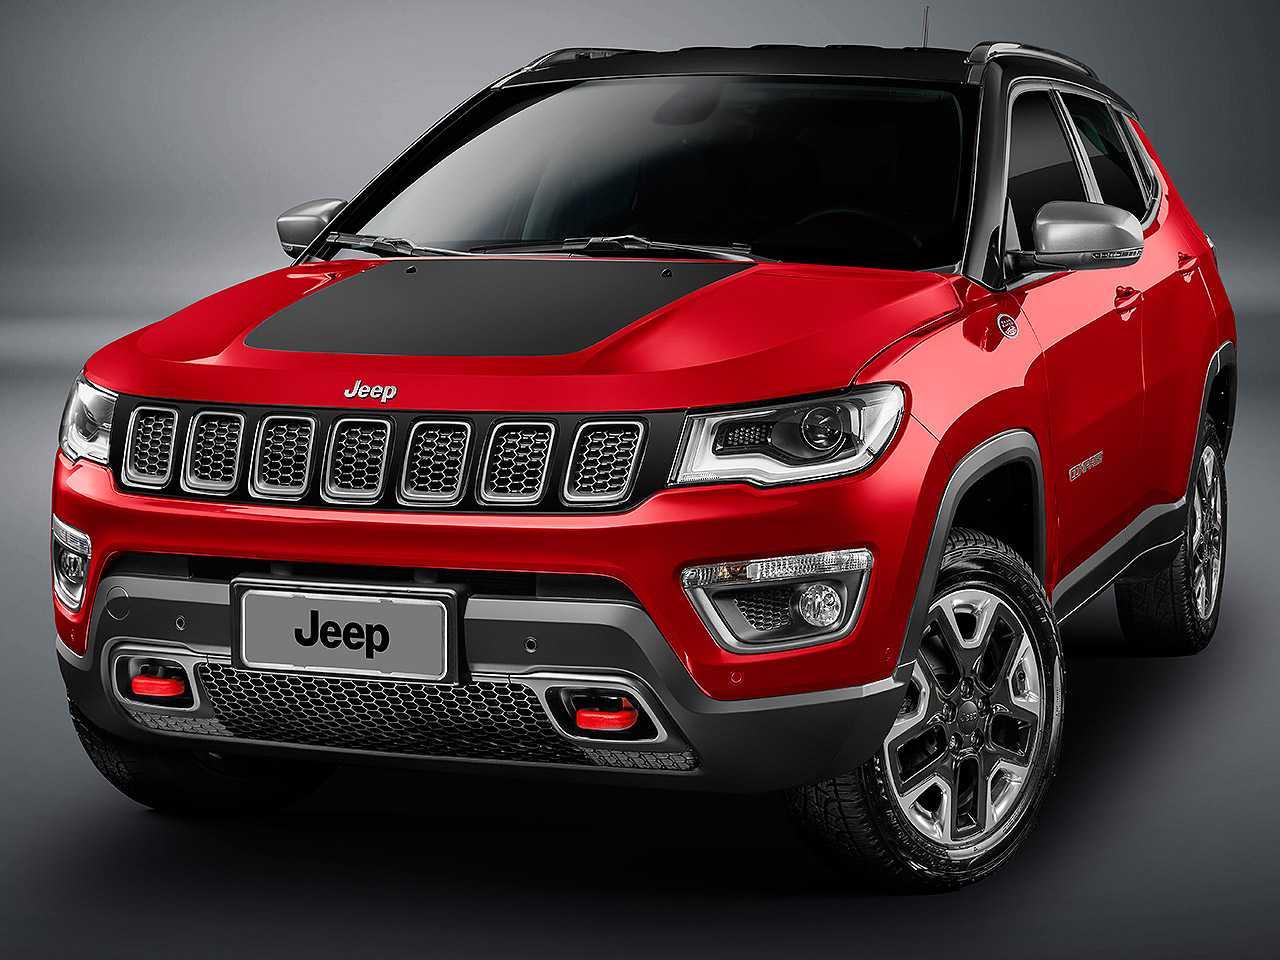 JeepCompass 2021 - ângulo frontal